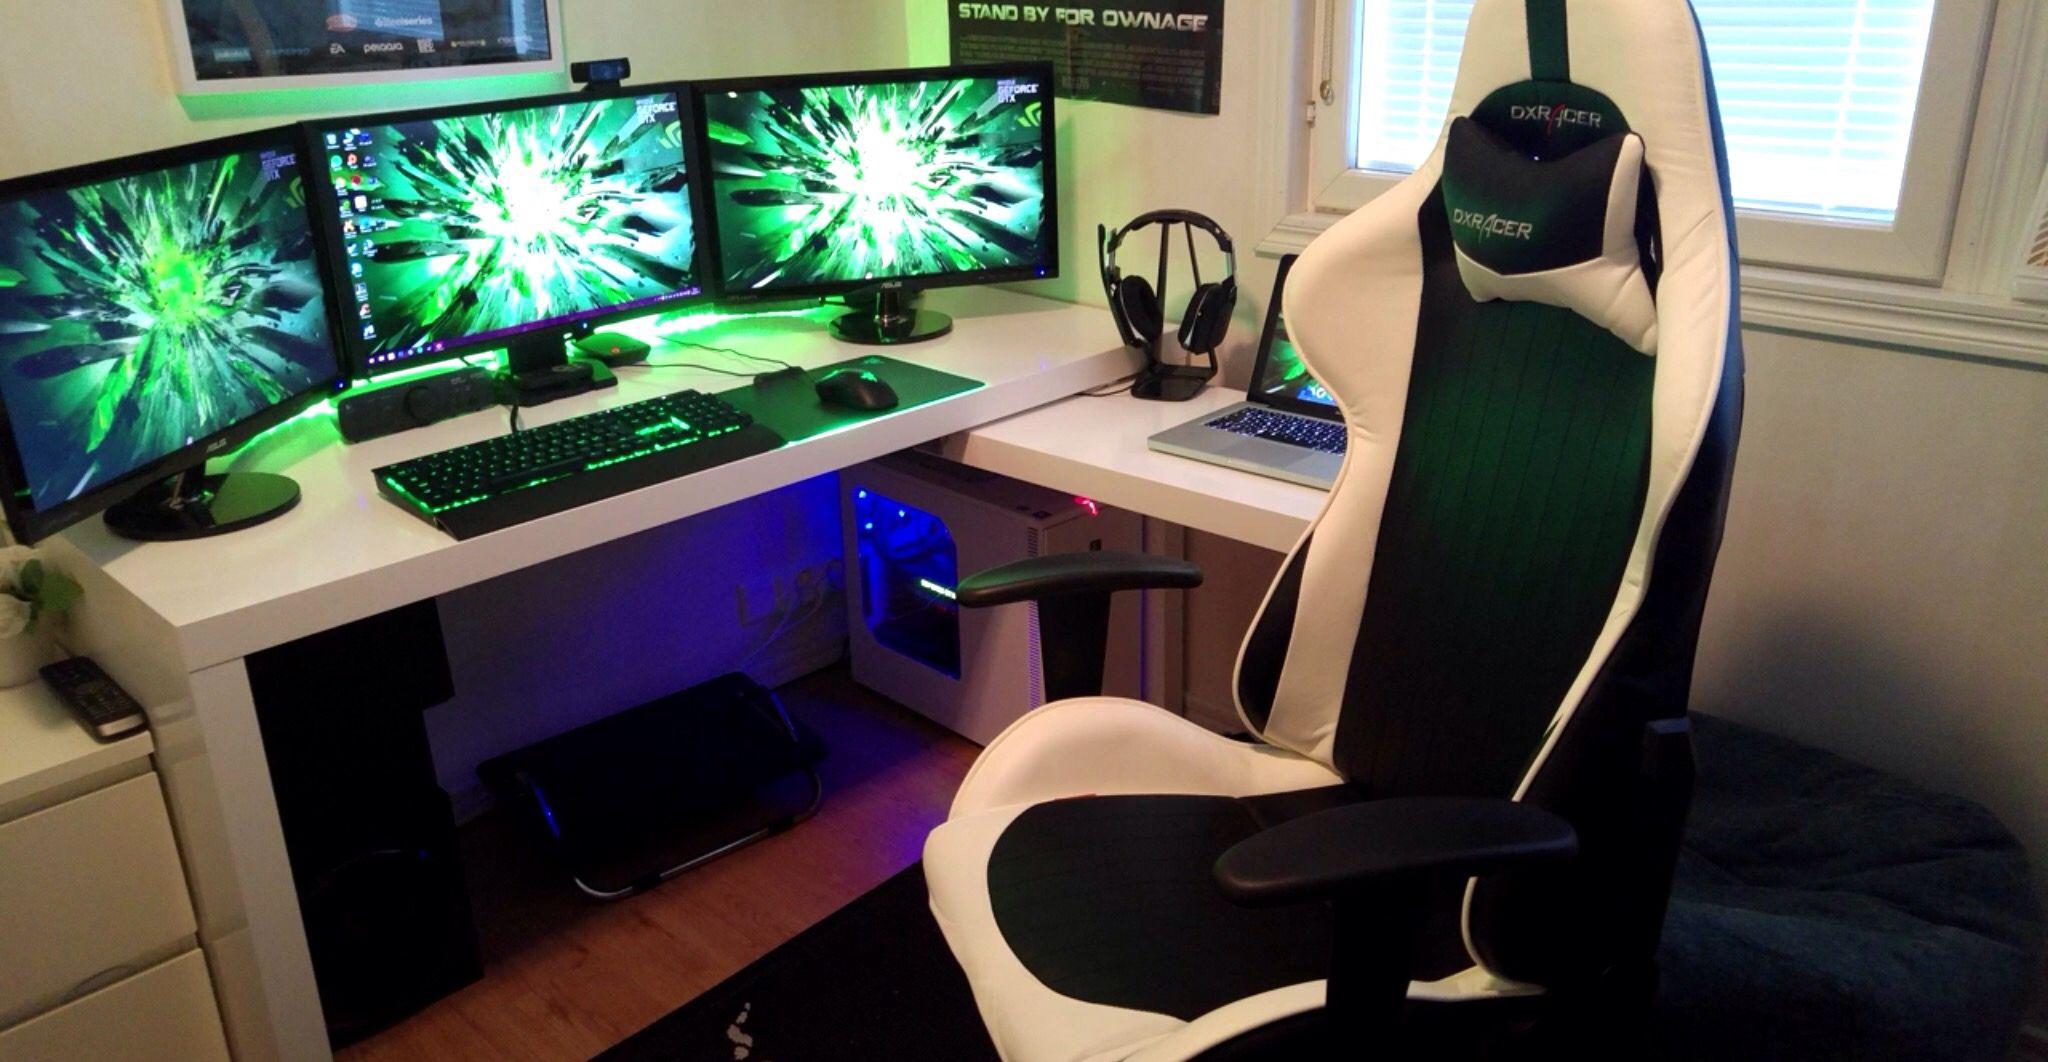 Green, Black, And White Triple Monitor Setup Striped